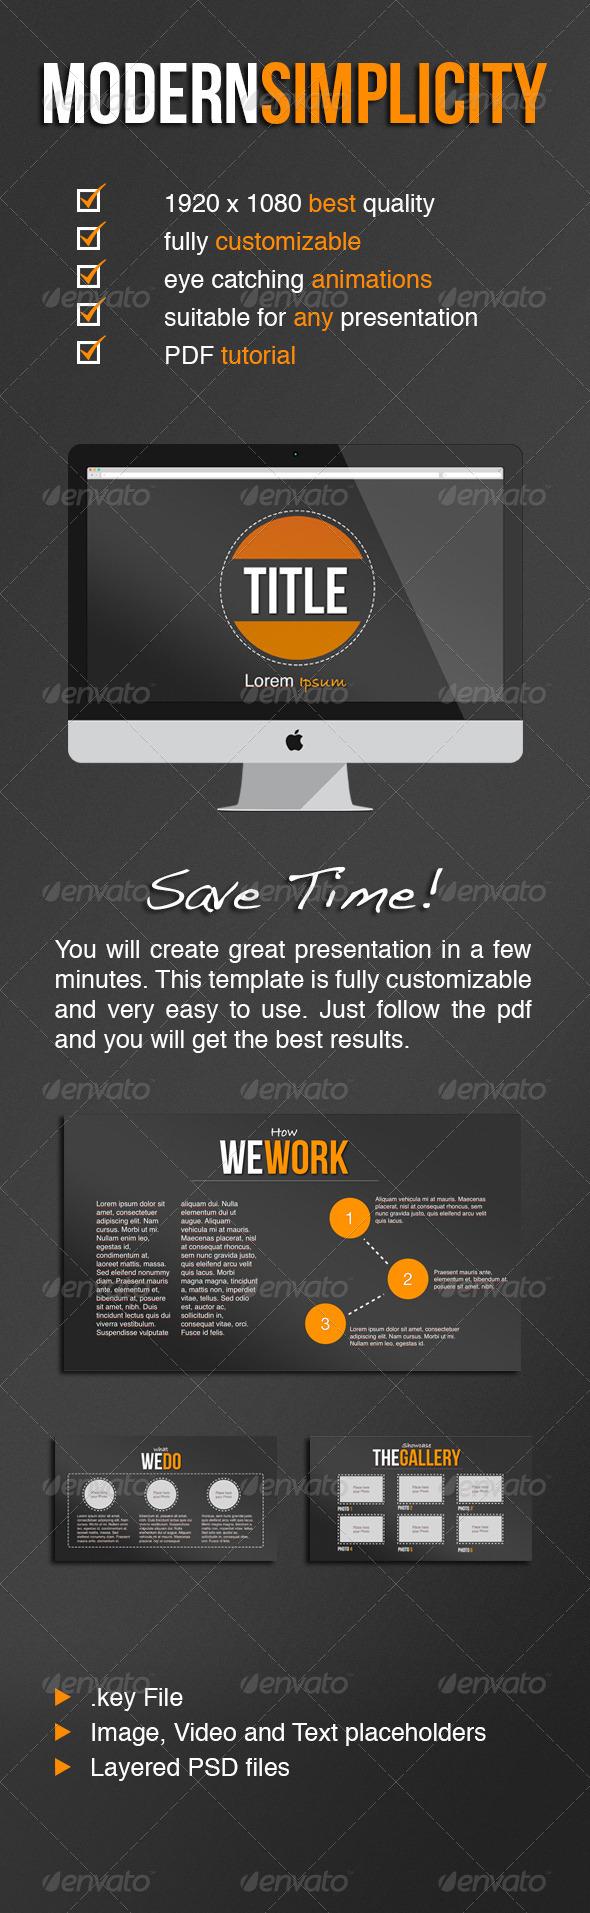 GraphicRiver Modern Simplicity 5128210